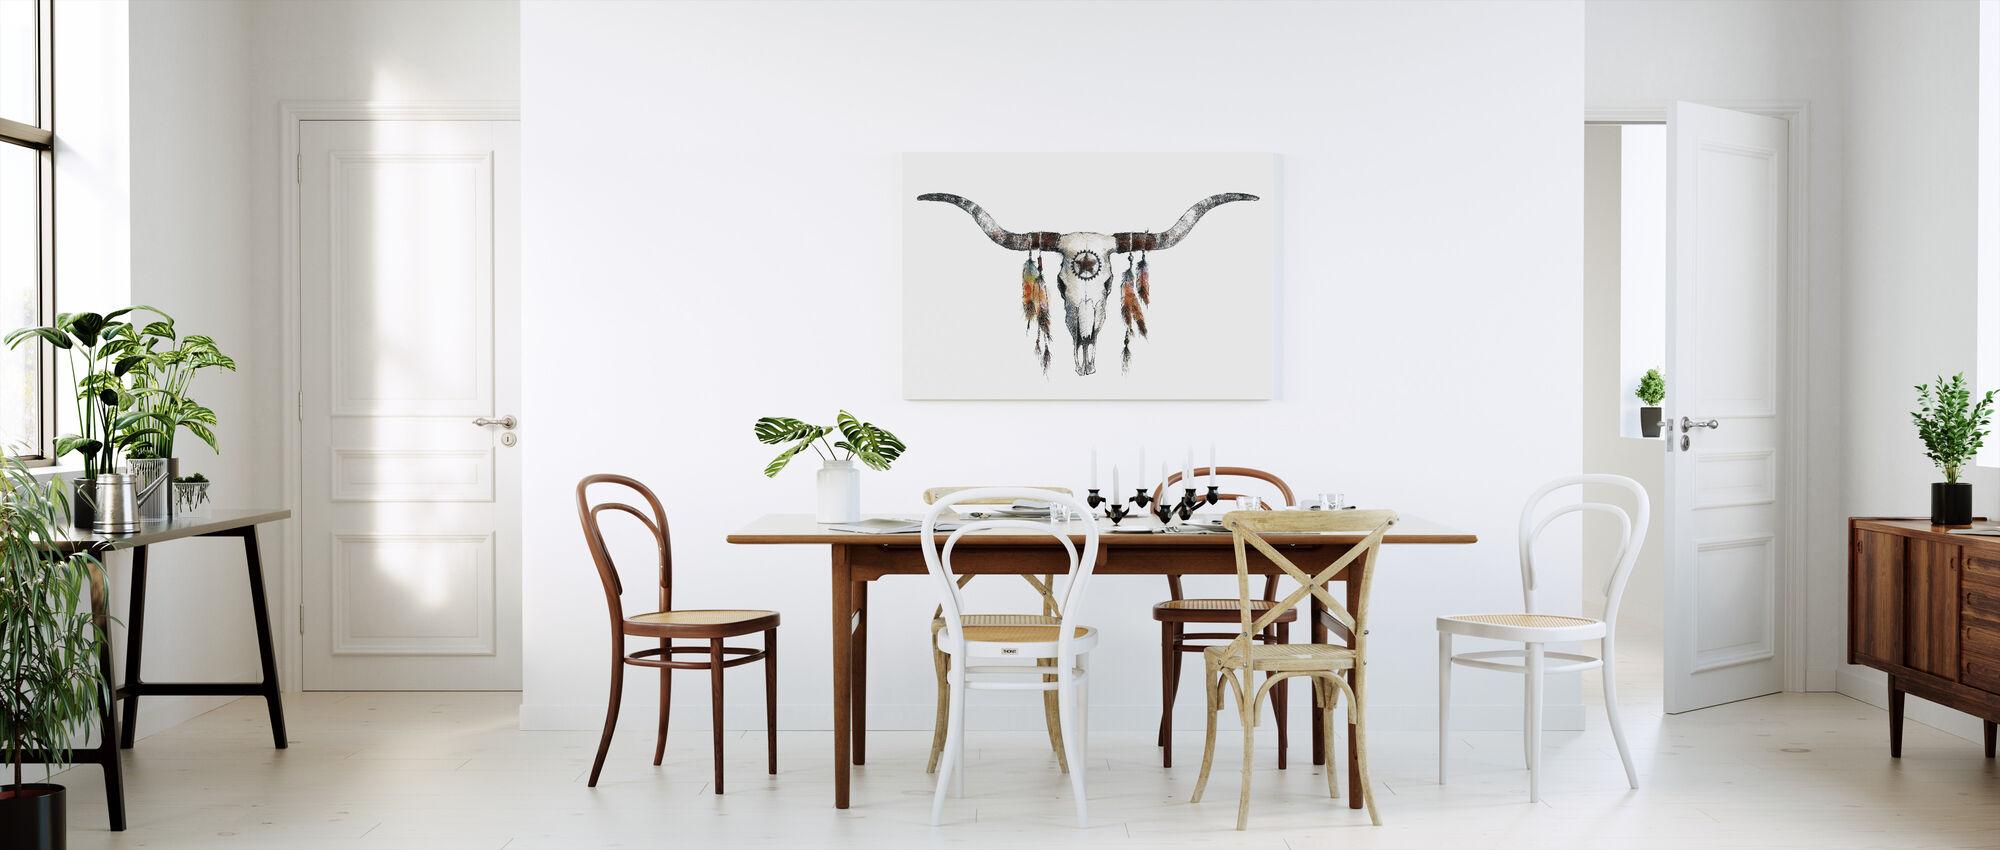 Longhorn - Canvas print - Kitchen